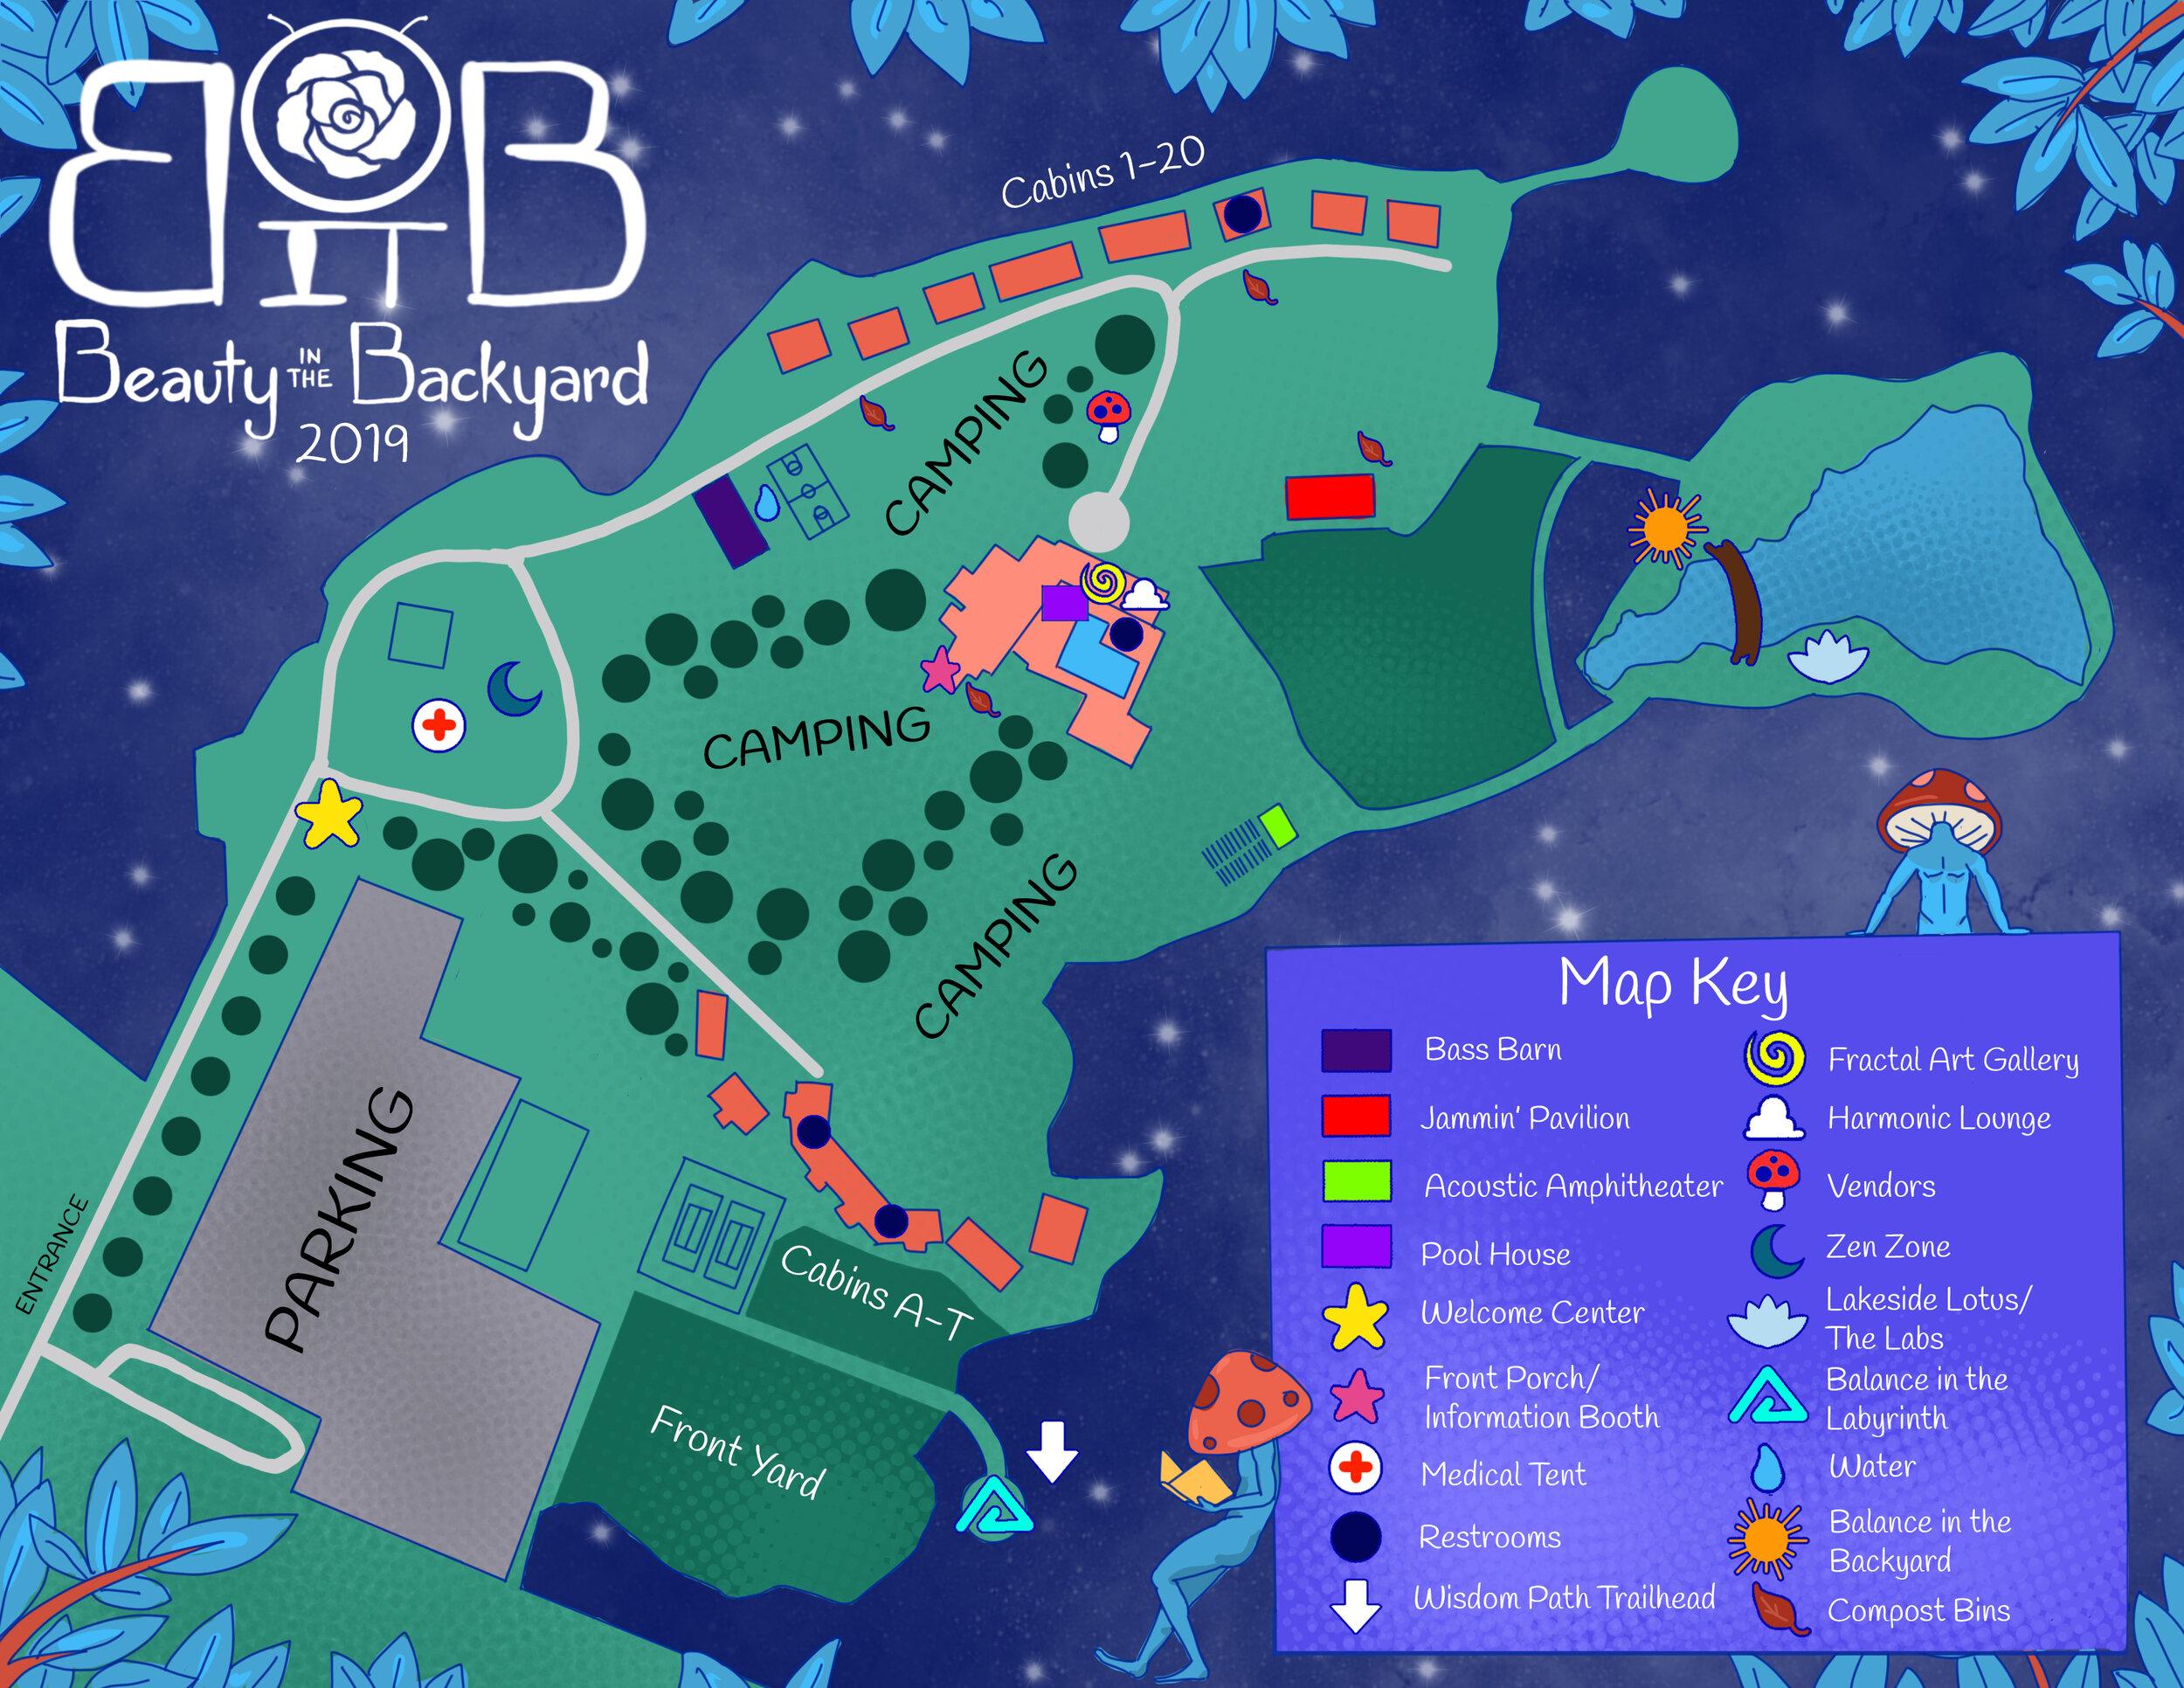 Beautyinthebackyard2019map.jpg